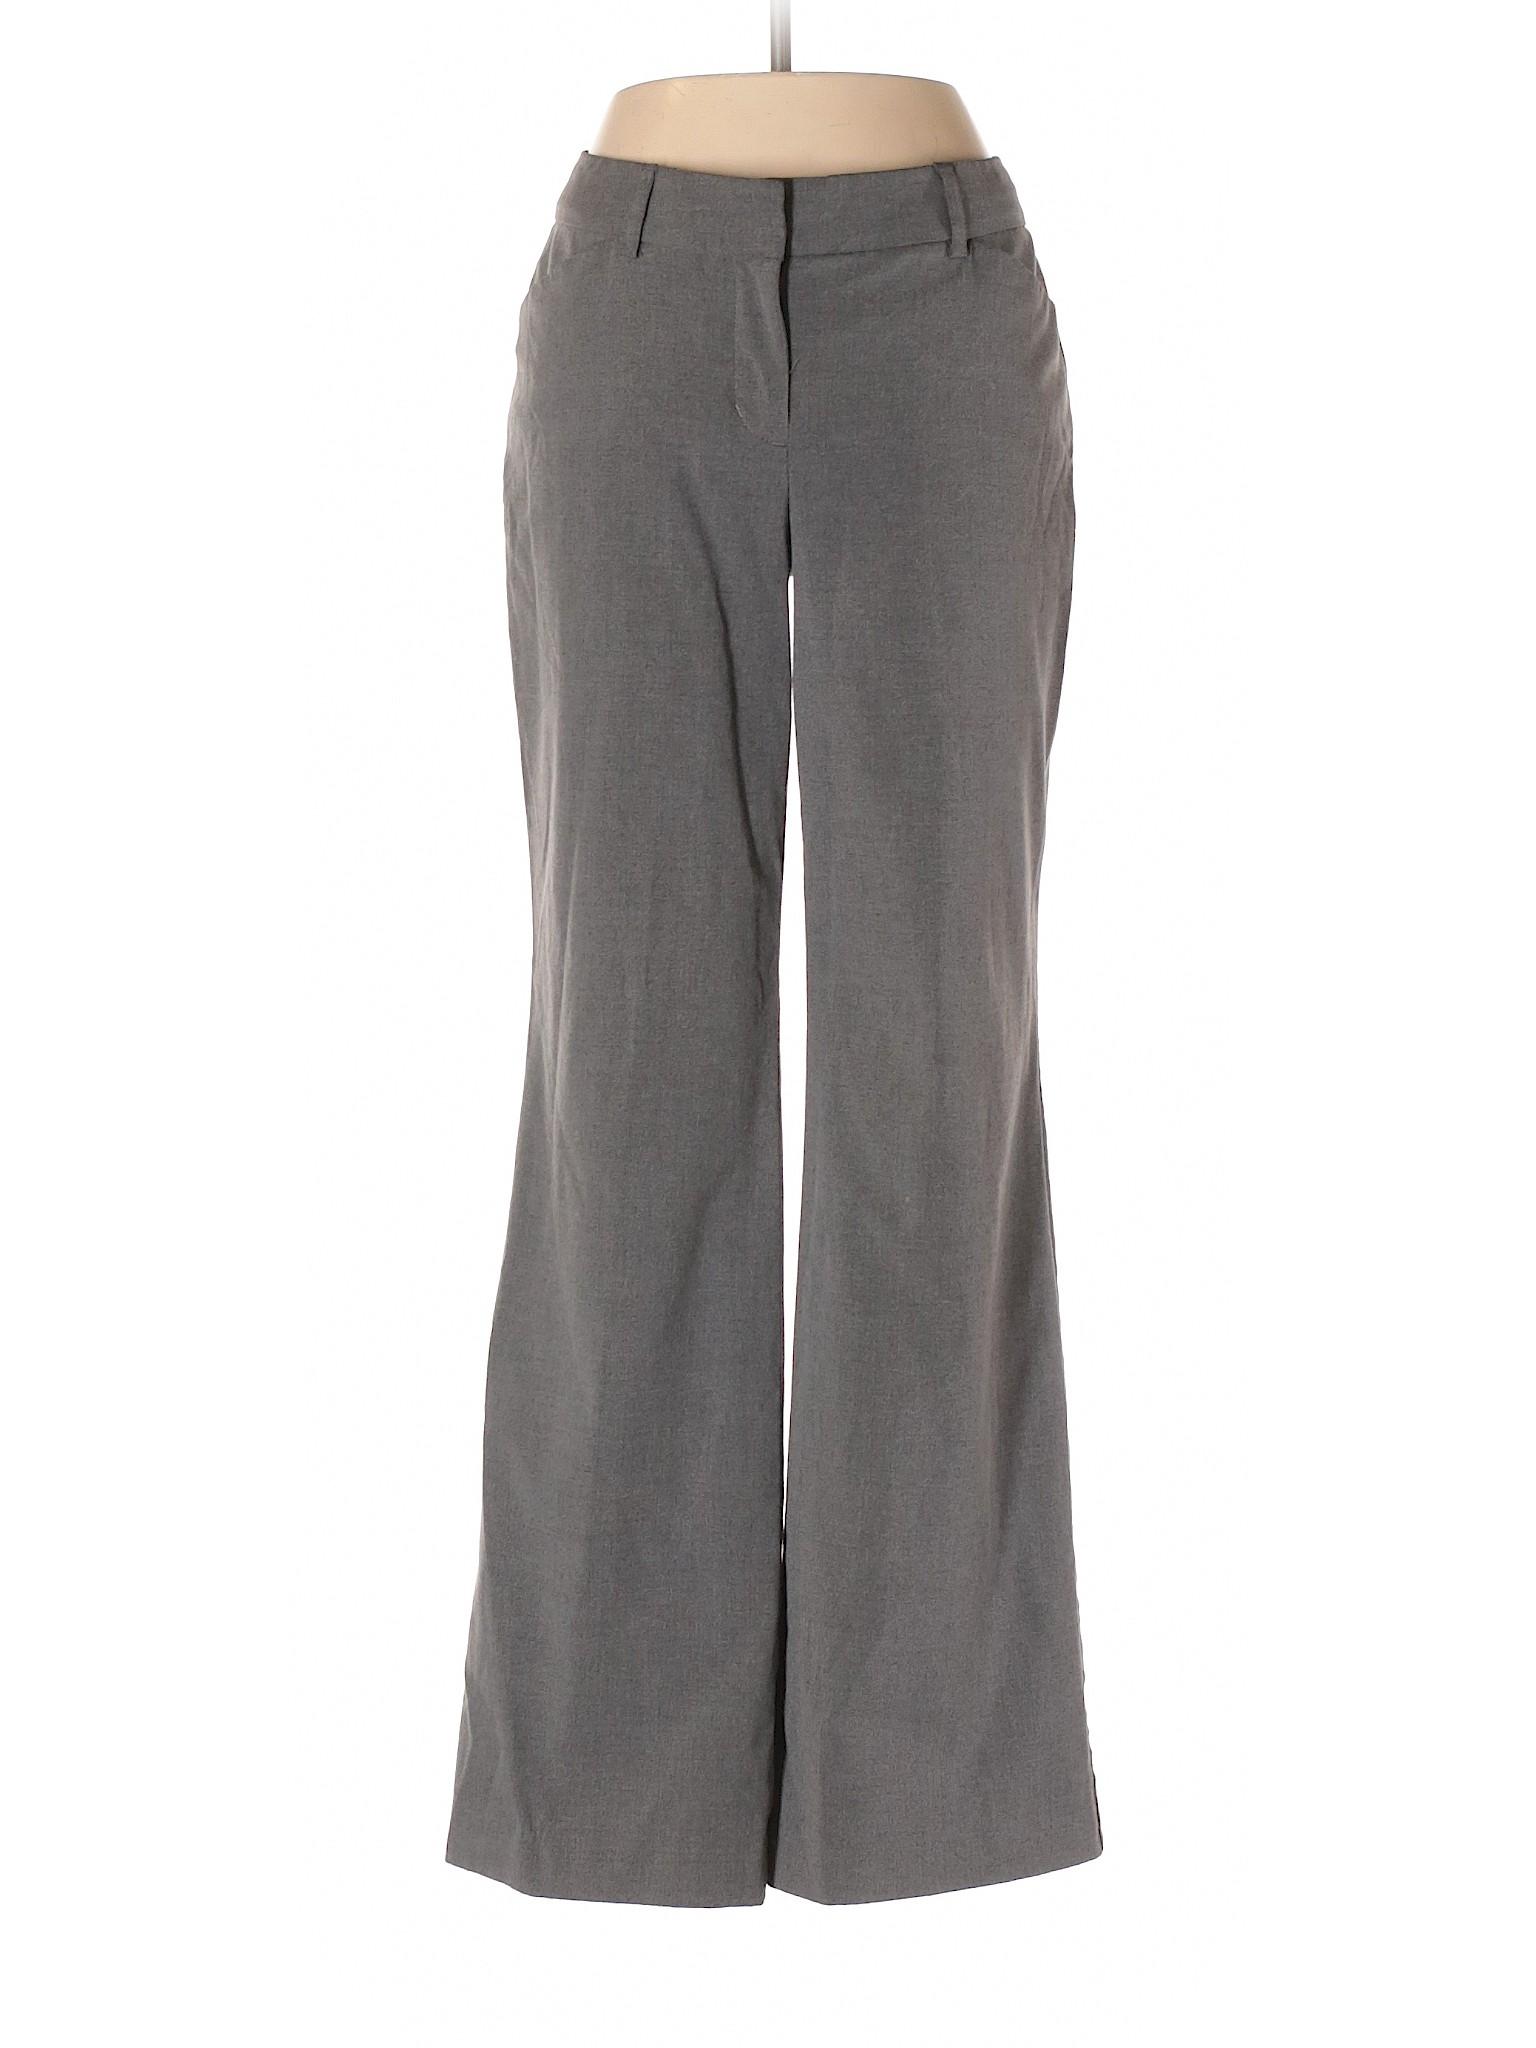 Pants Boutique Express winter Dress Design Studio xOgTOzw7